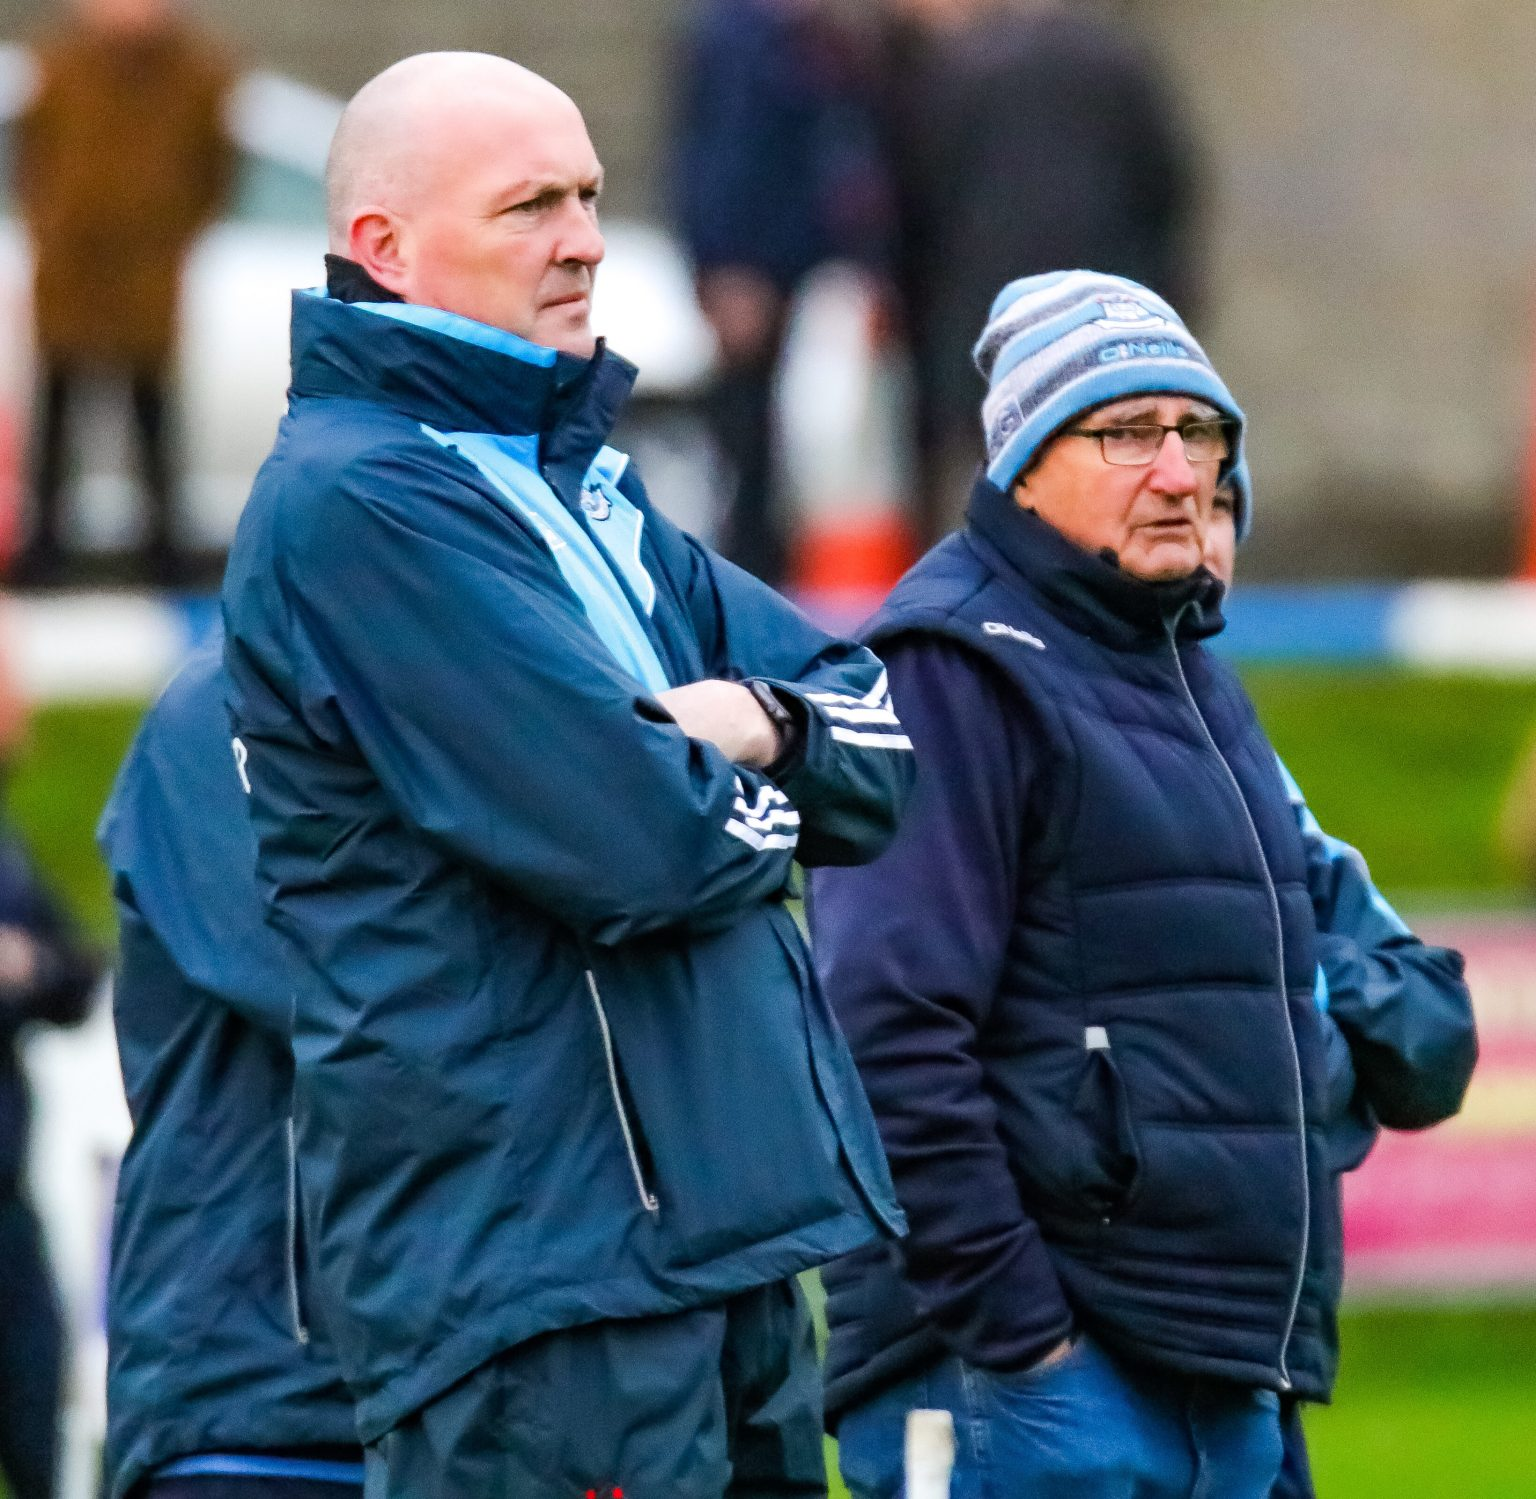 Dublin Senior Hurling Manager Pat Gilroy